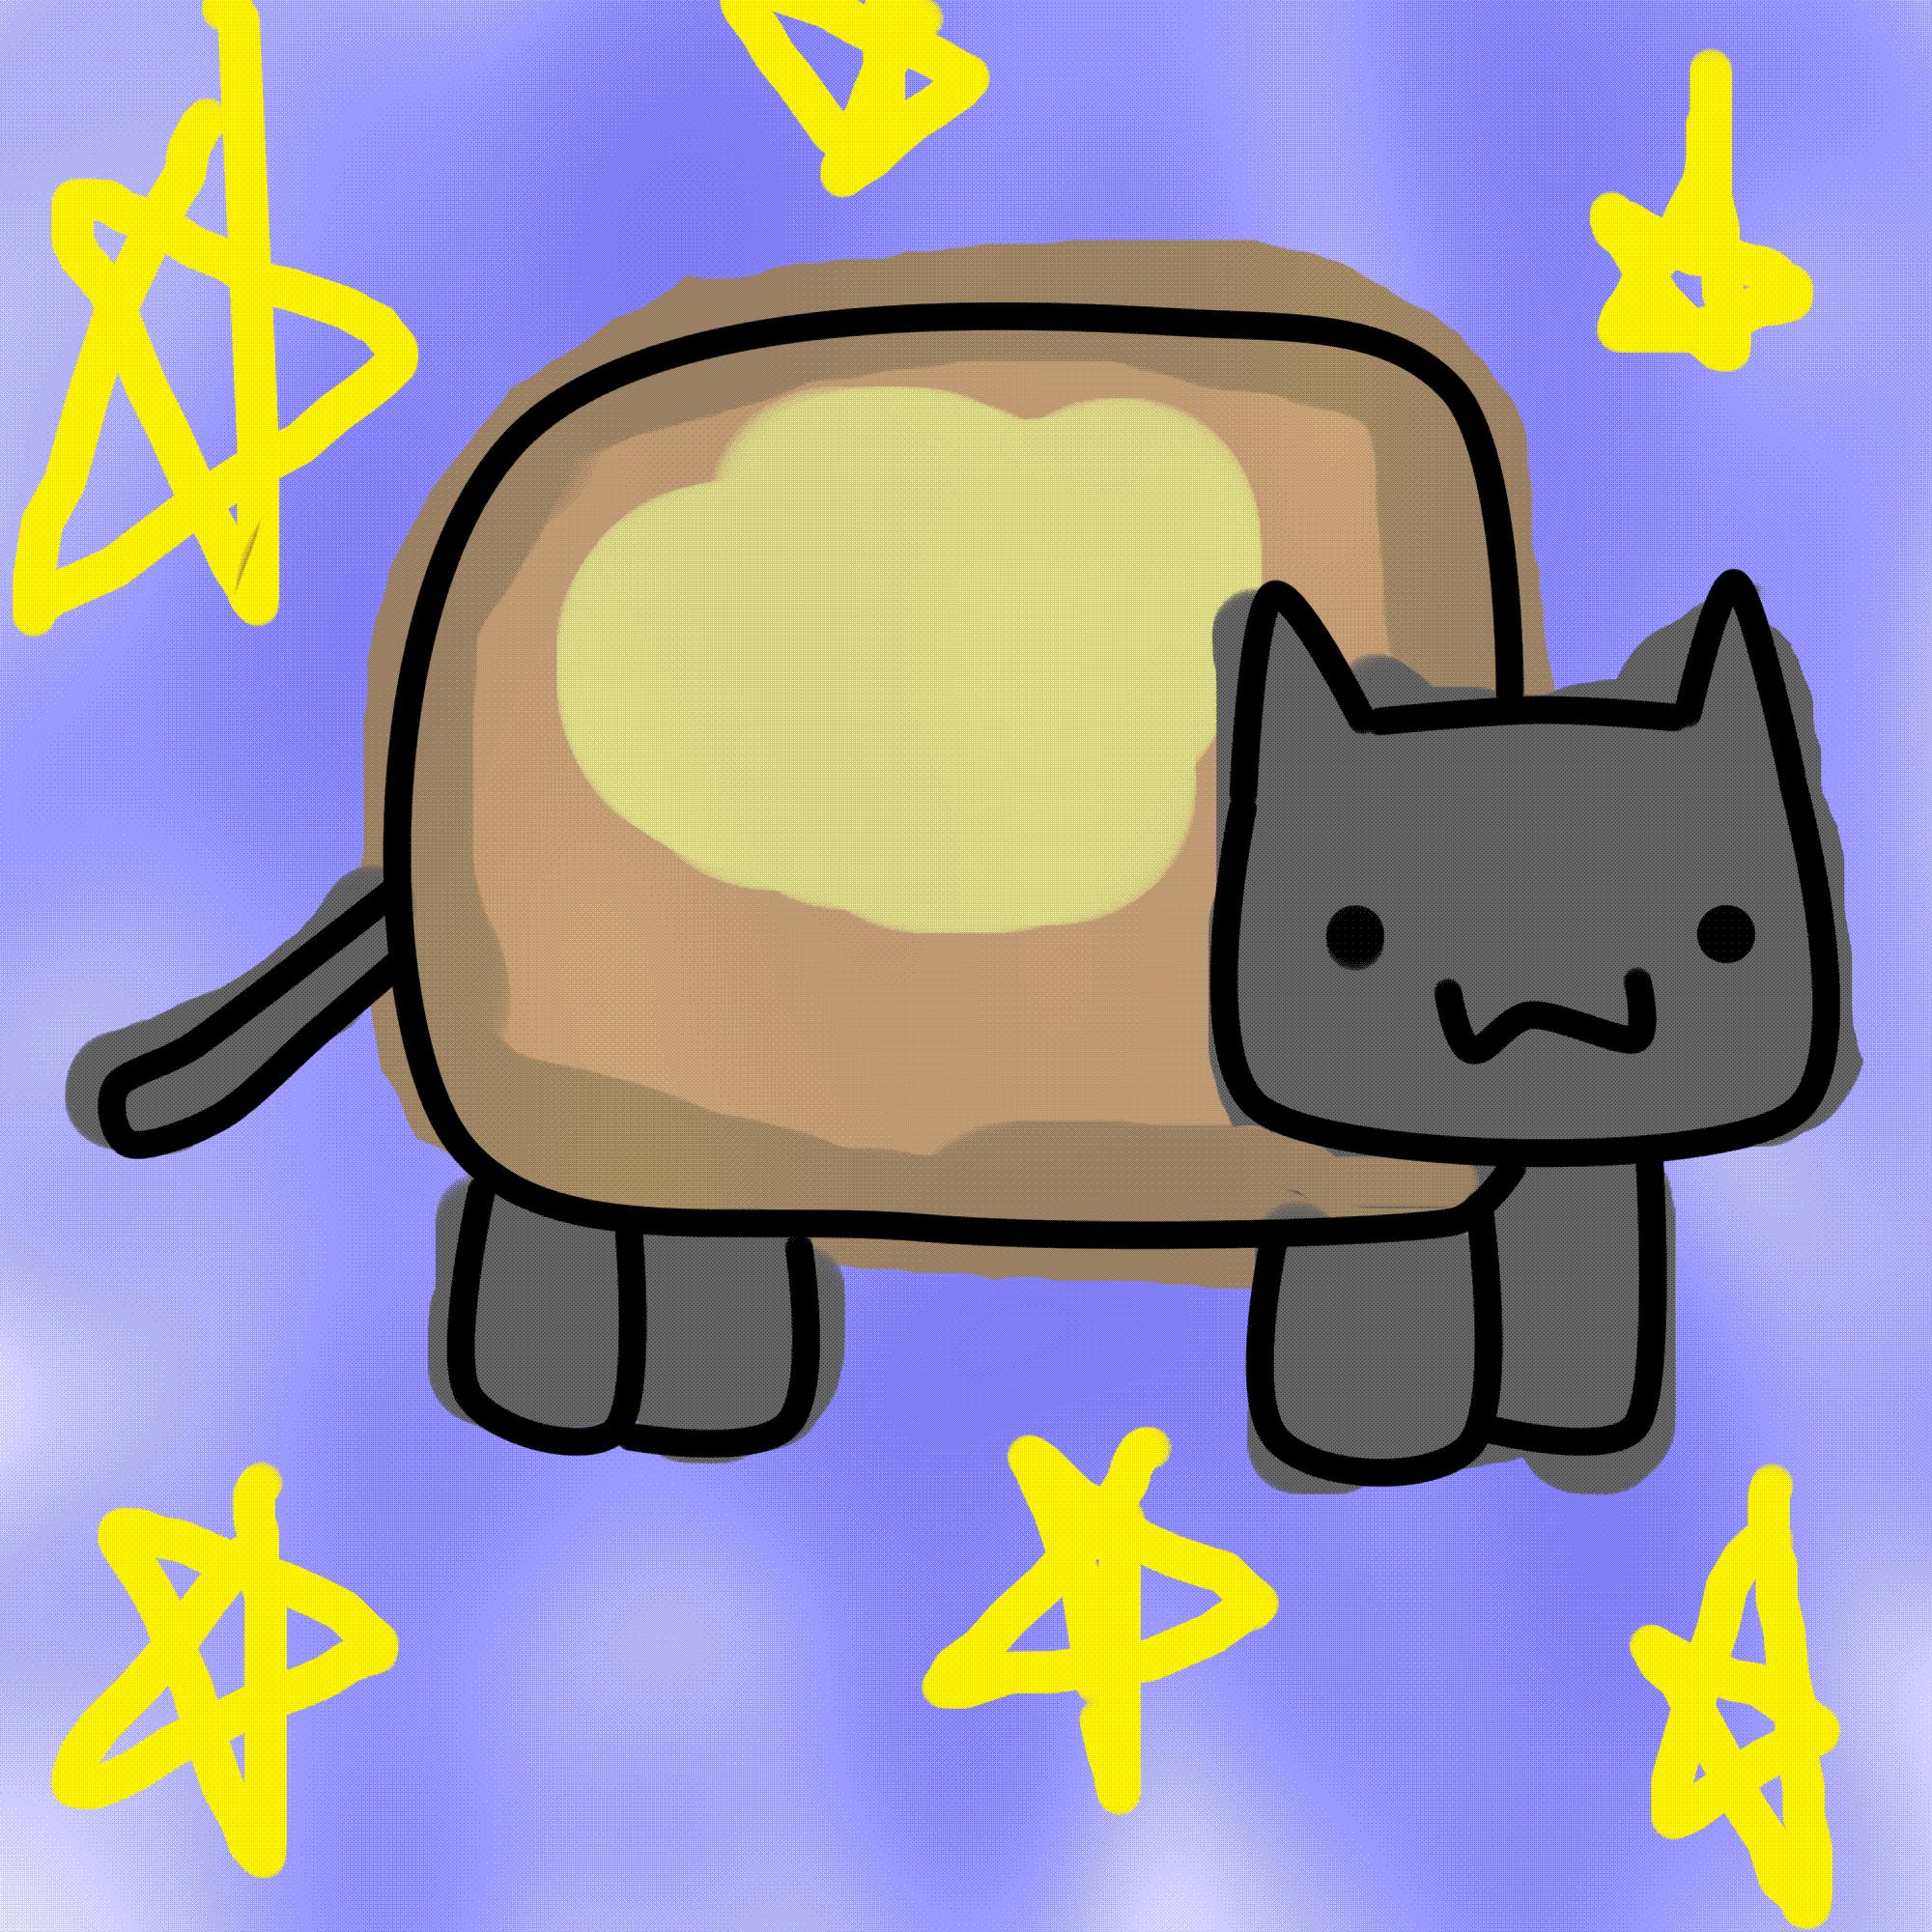 Nyan Cat Wallpaper Animated Wwwimagessurecom